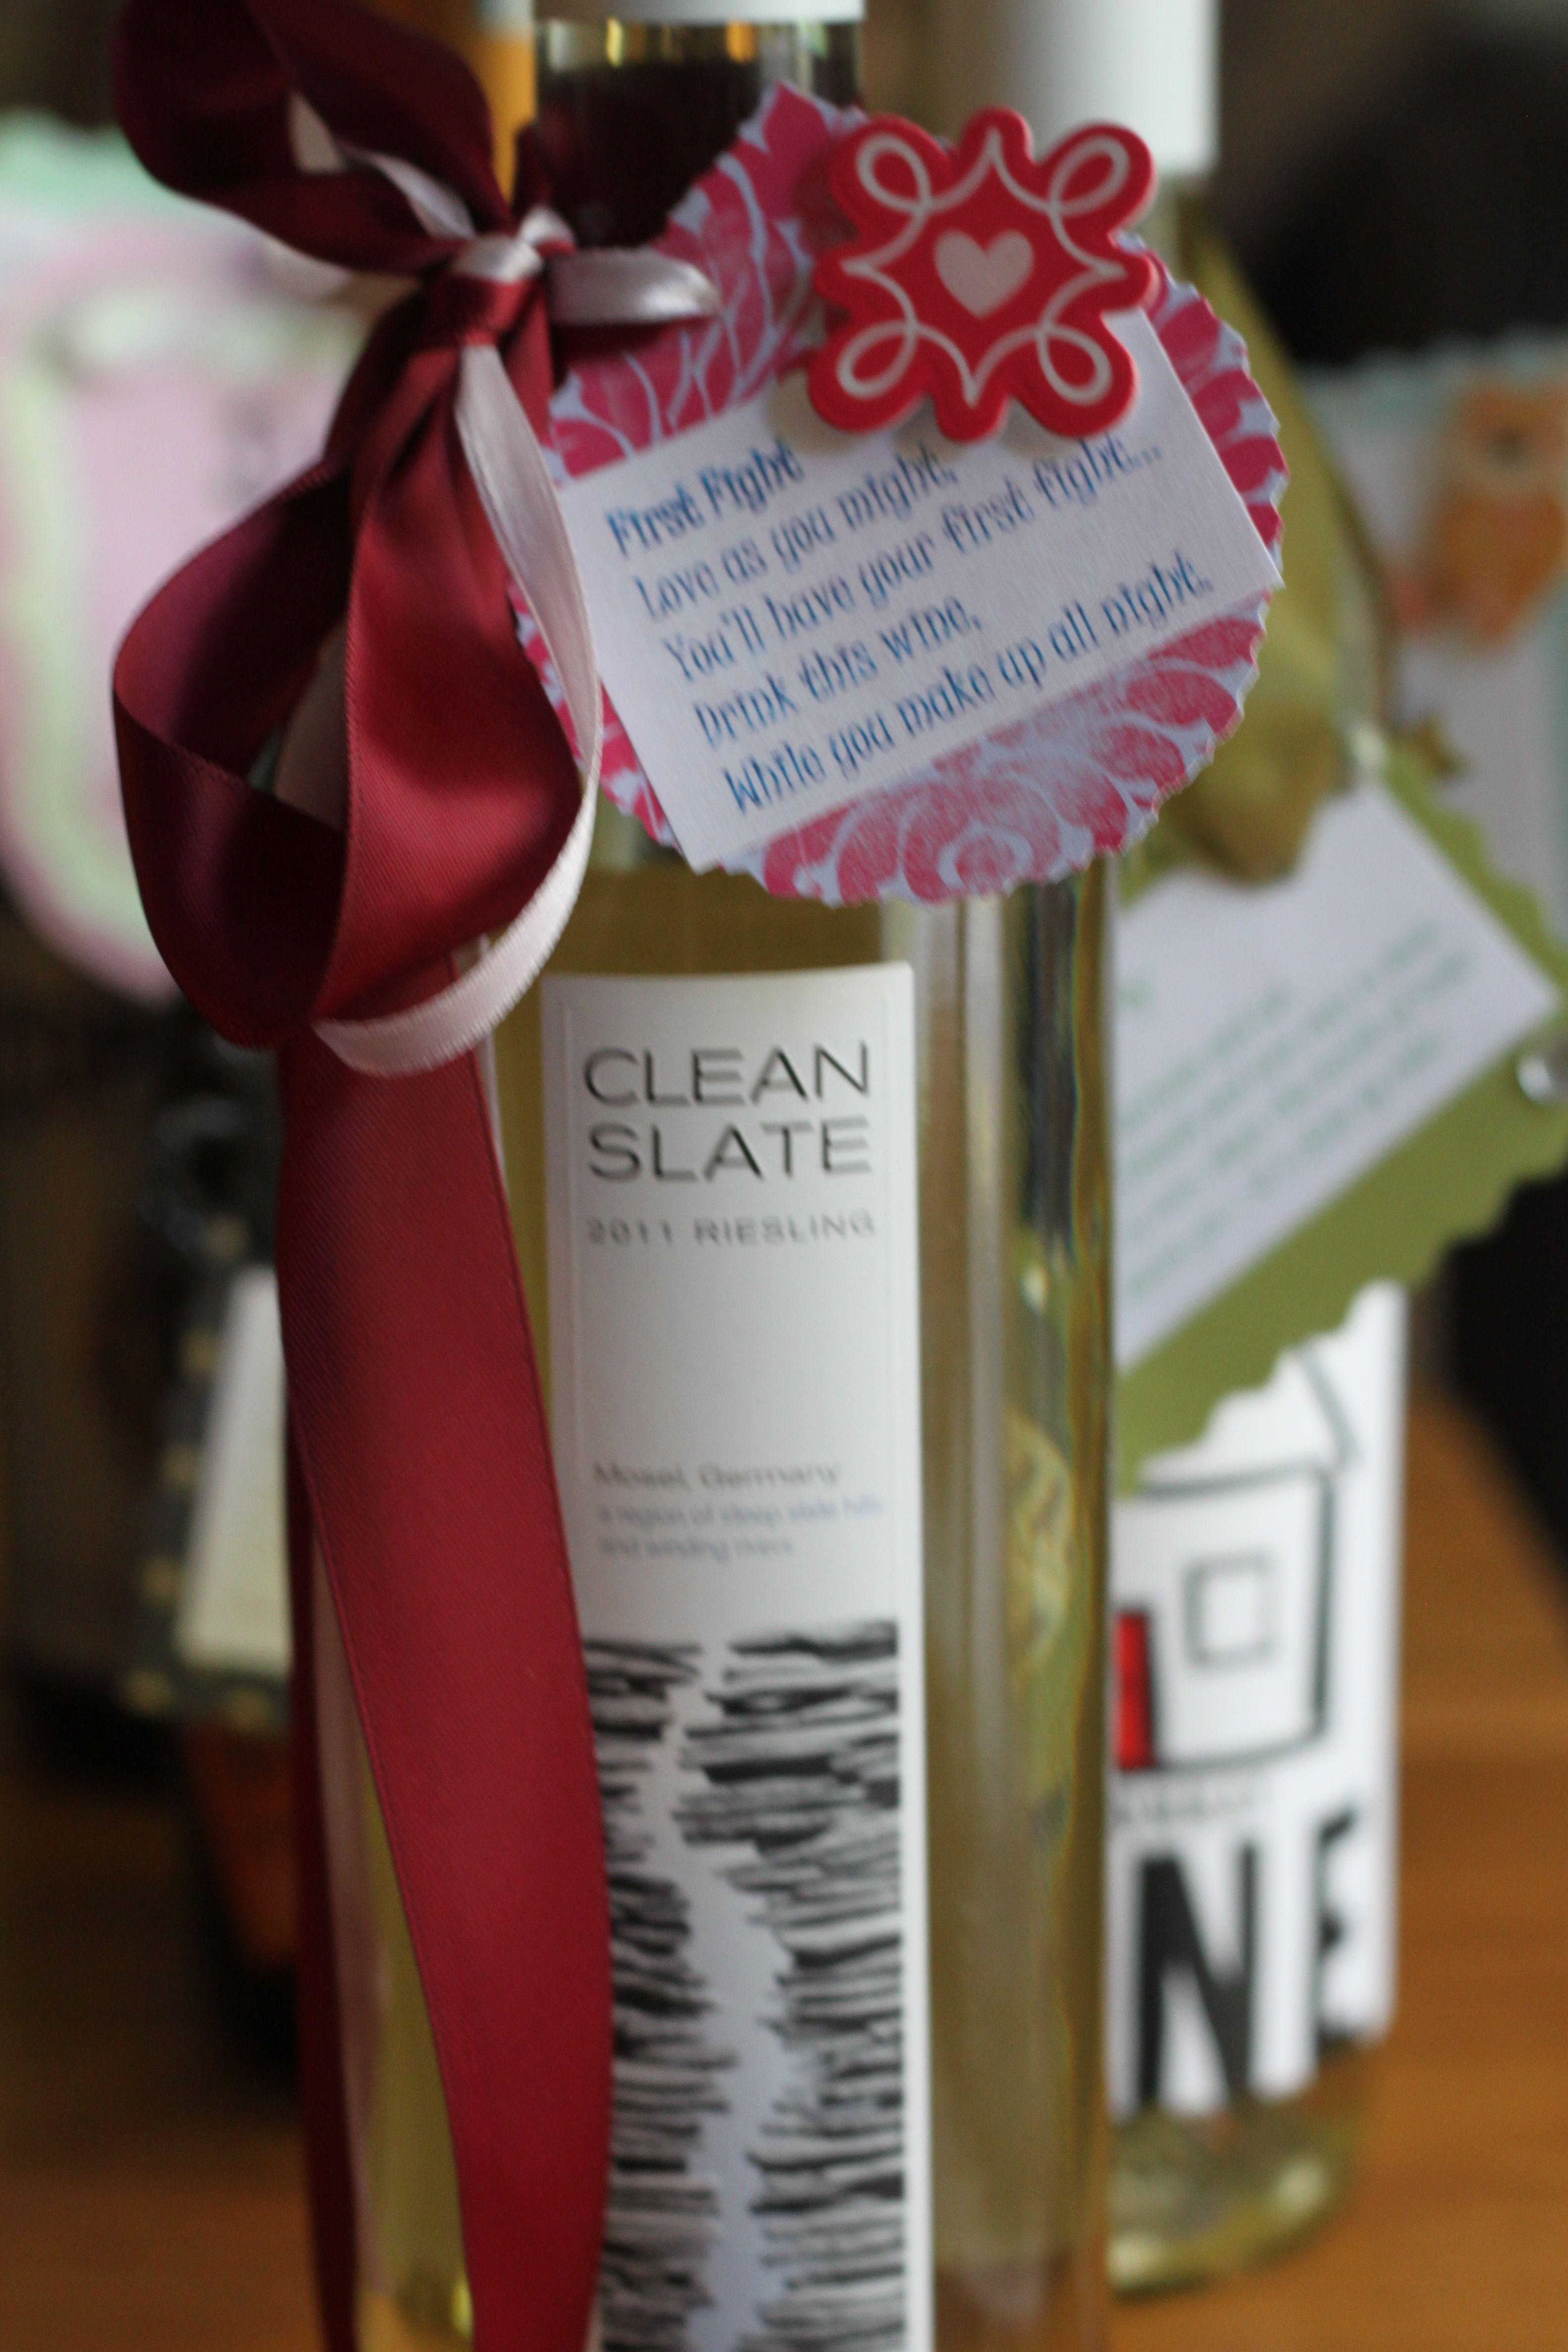 Bridal Shower Gift Milestone Wine Poem Basket Create An Adorable Poem Tag Bridal Shower Wine Bridal Shower Wine Basket Milestone Wine Basket Bridal Showers